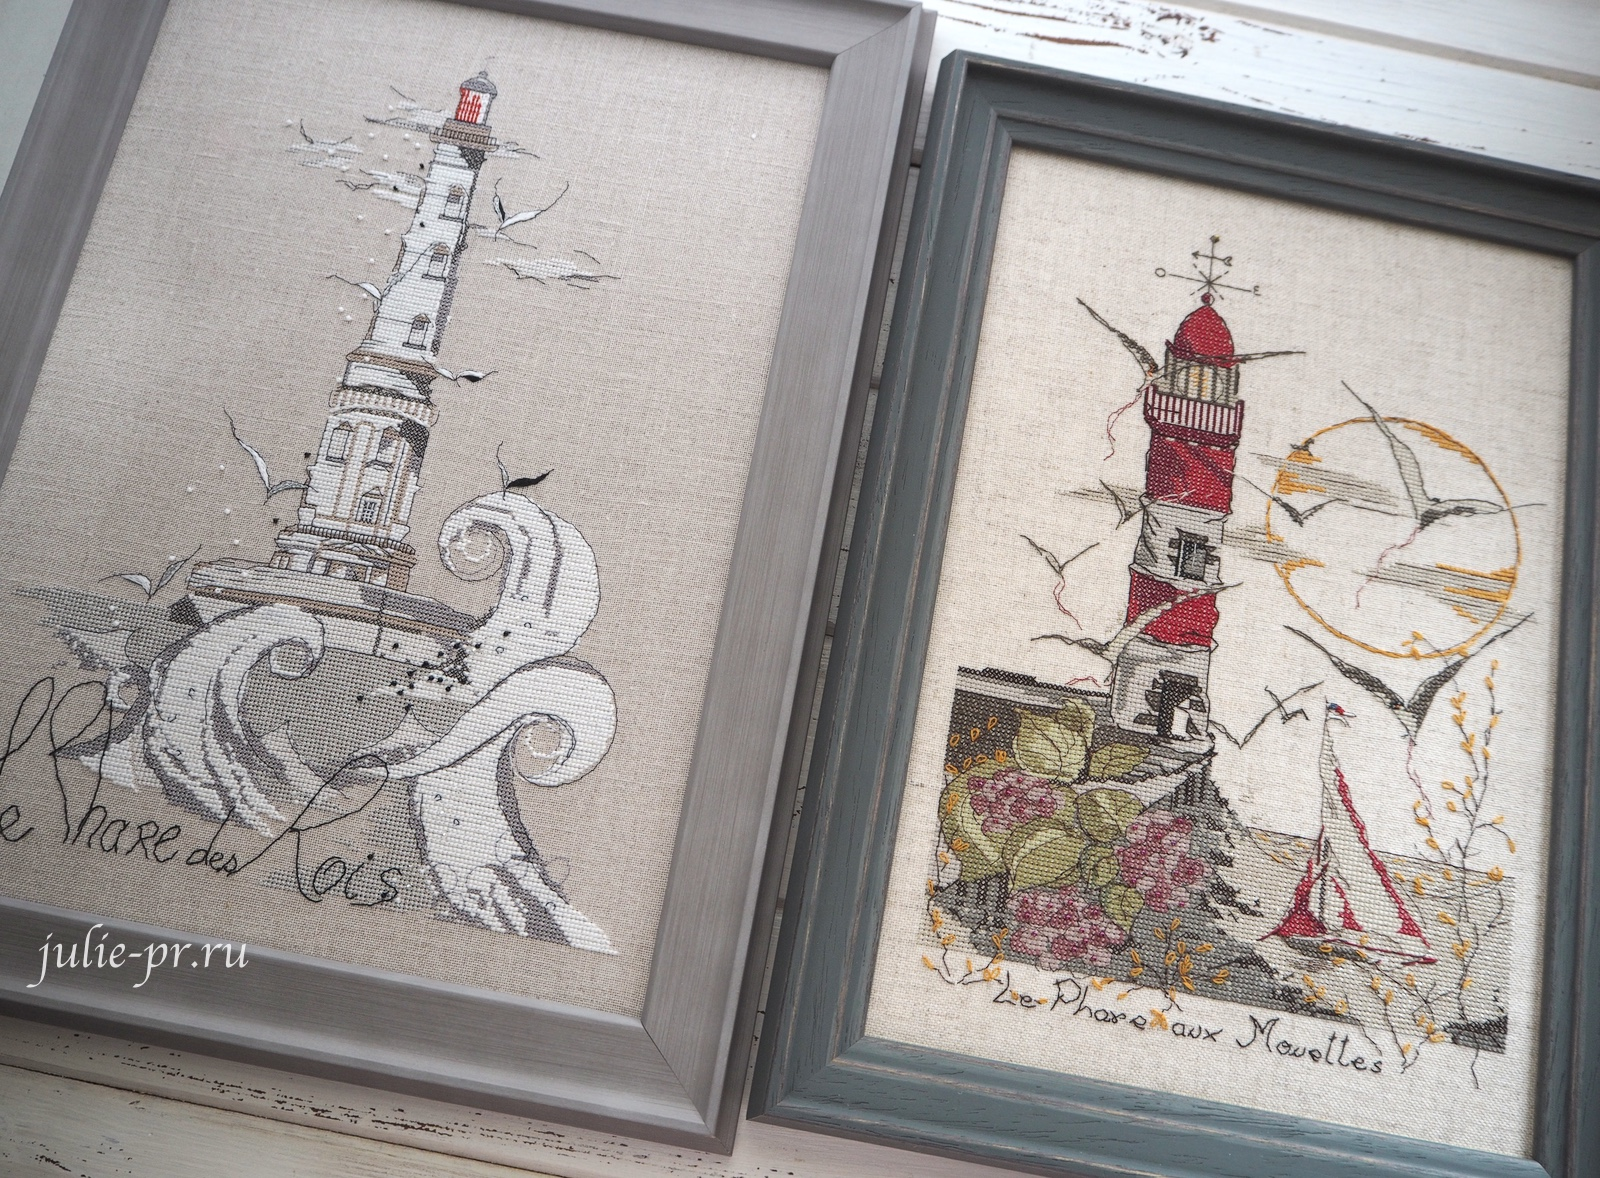 Soizic, Le Phare des Rois, Кордуанский маяк, Phare de Cordouan, вышивка крестом, белый маяк, французская вышивка, оформление, красный маяк с чайками, Le phare aux mouettes